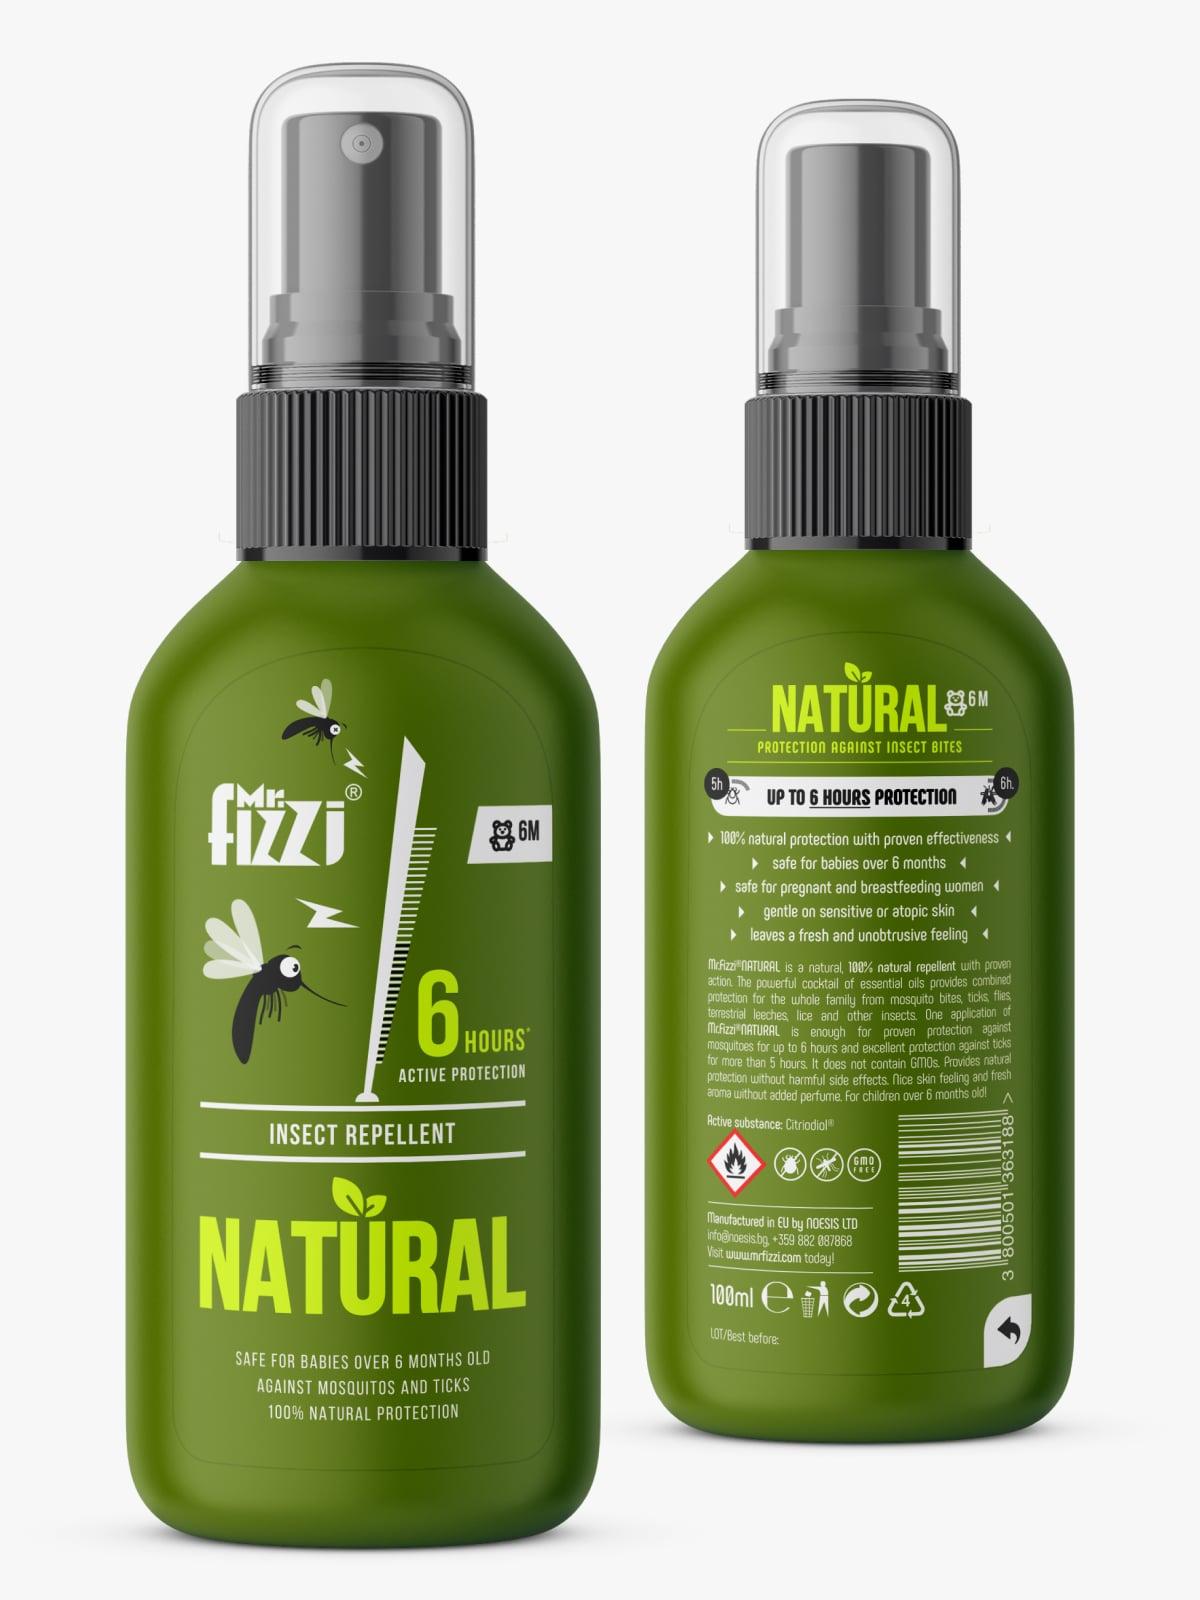 mr-fizzi-natural-insect-repellent